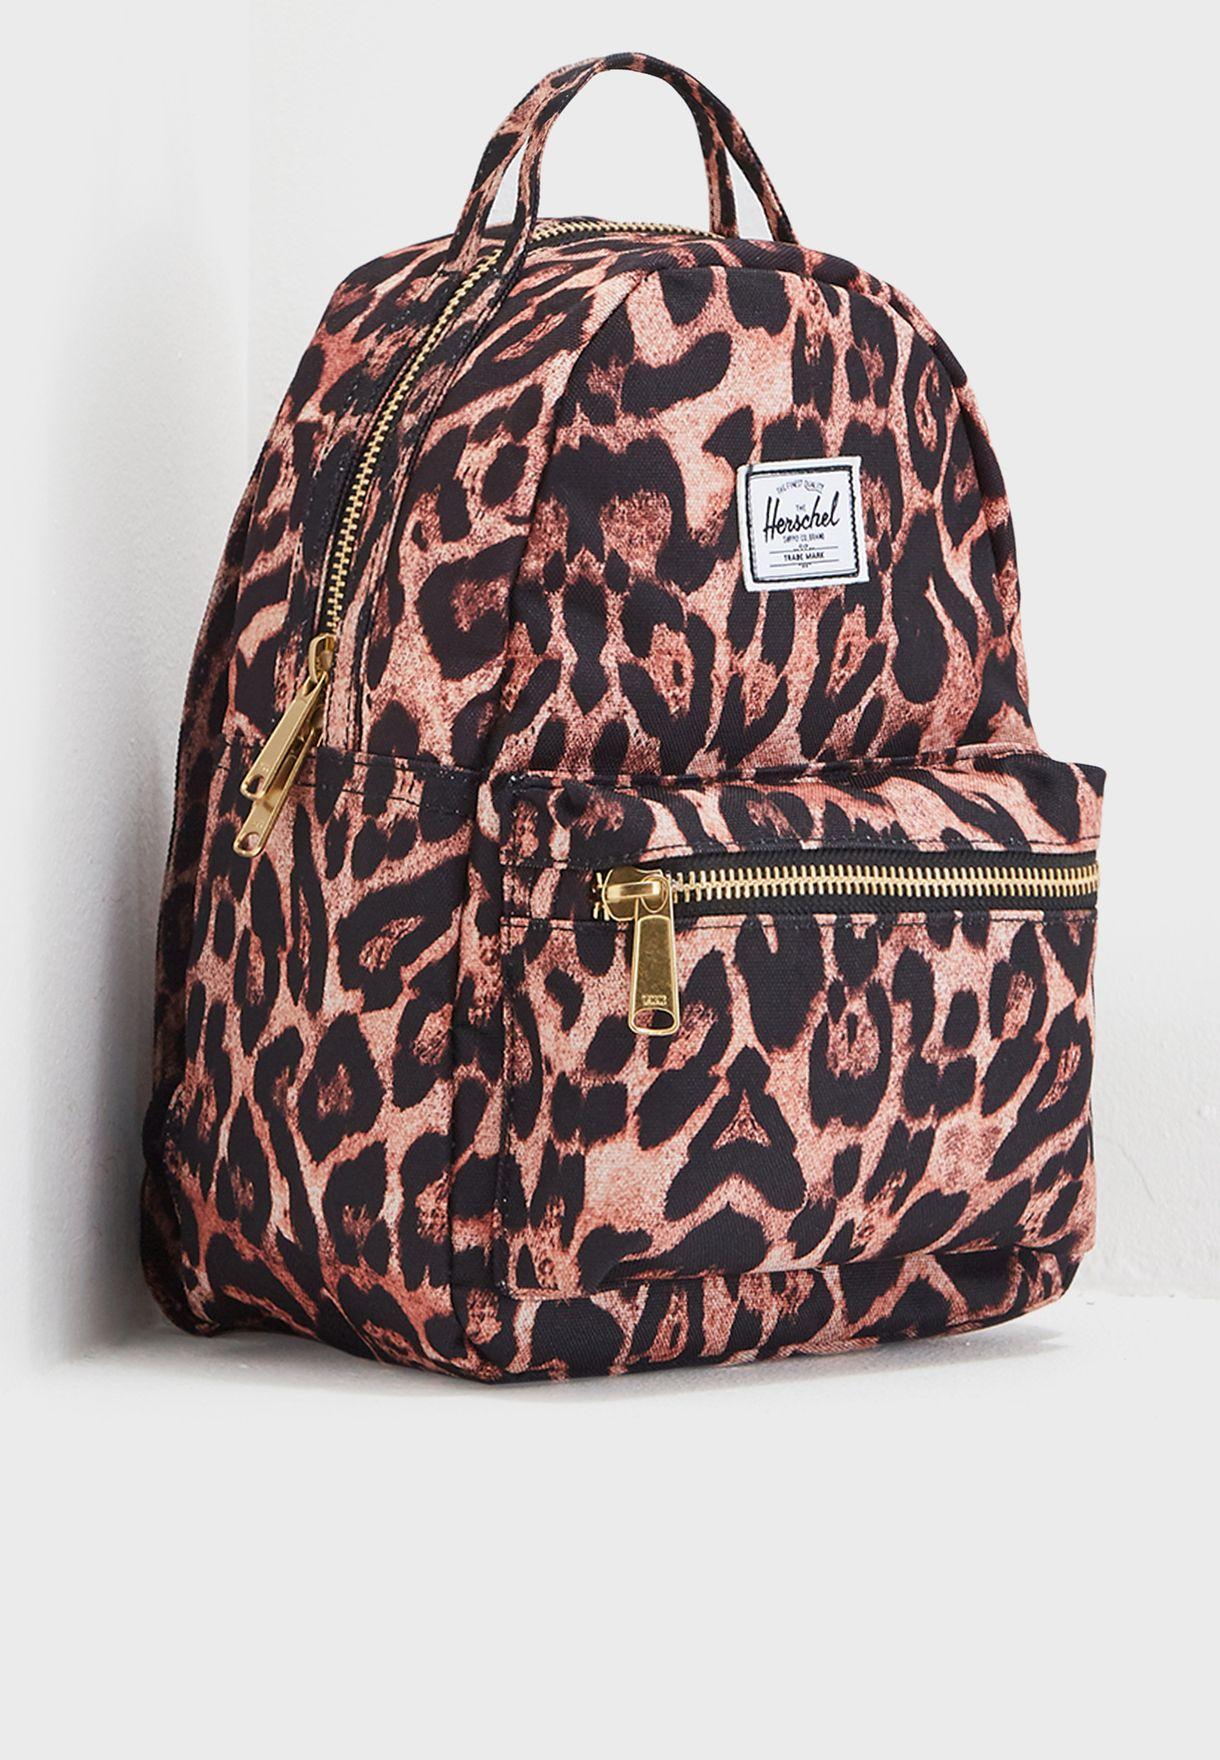 53d6b274658 Shop Herschel prints Mini Nova Backpack 10501-02110-OS for Women in ...